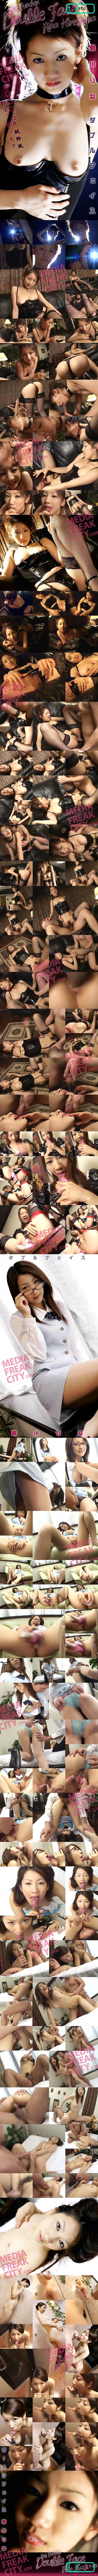 [PB 062] Double FACE : Rina Himekawa  姫川りな Rina Himekawa PB